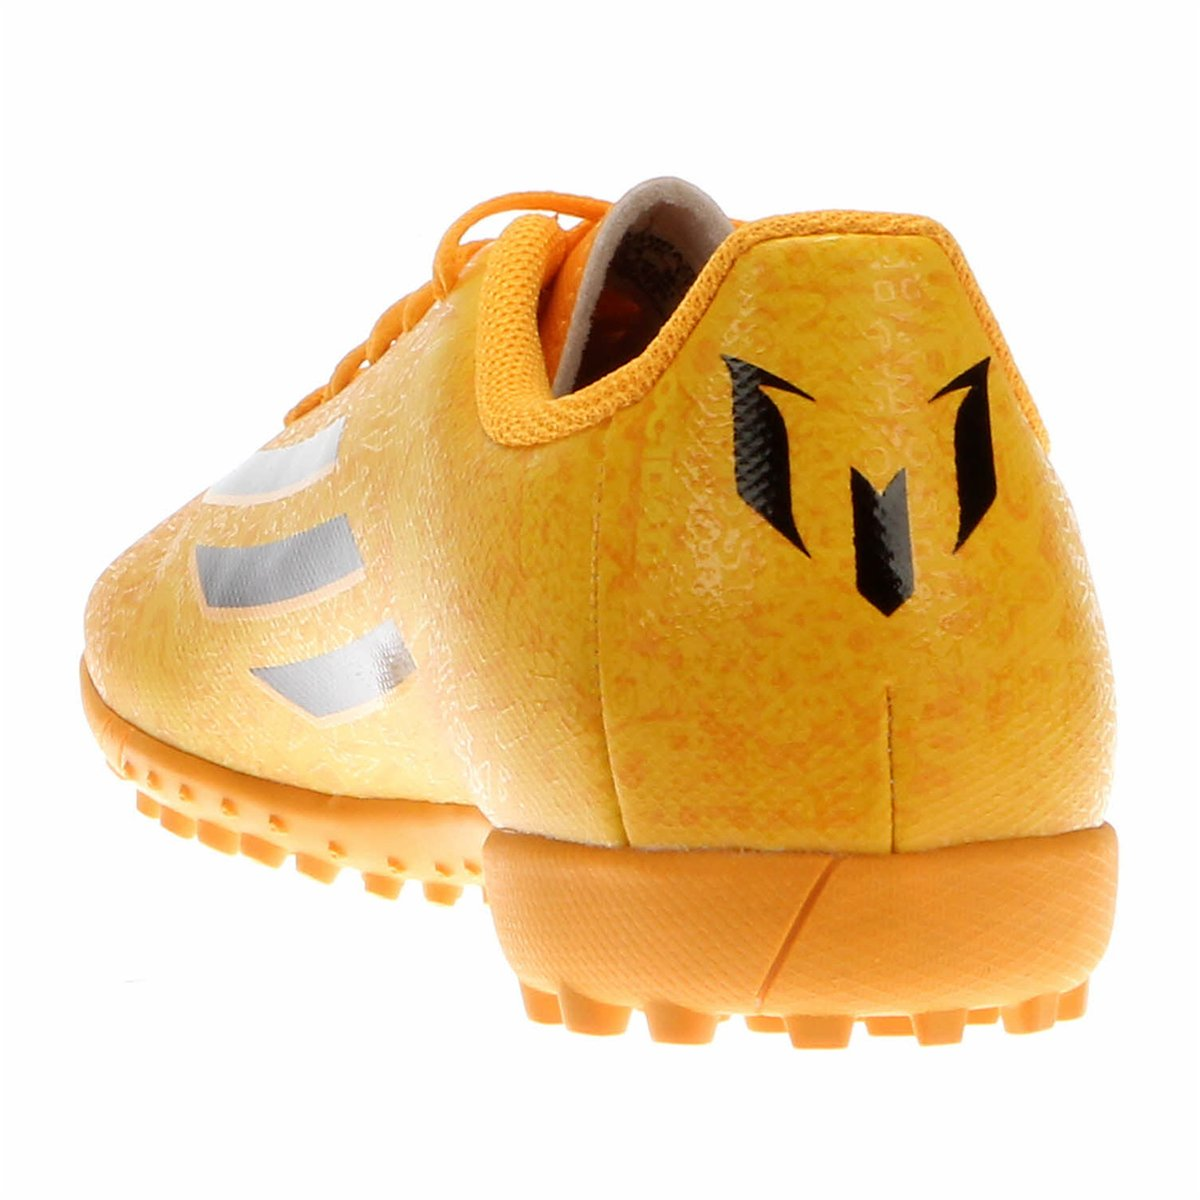 Chuteira Adidas F5 TF Messi Juvenil - Compre Agora  7b1bcd3e06c78